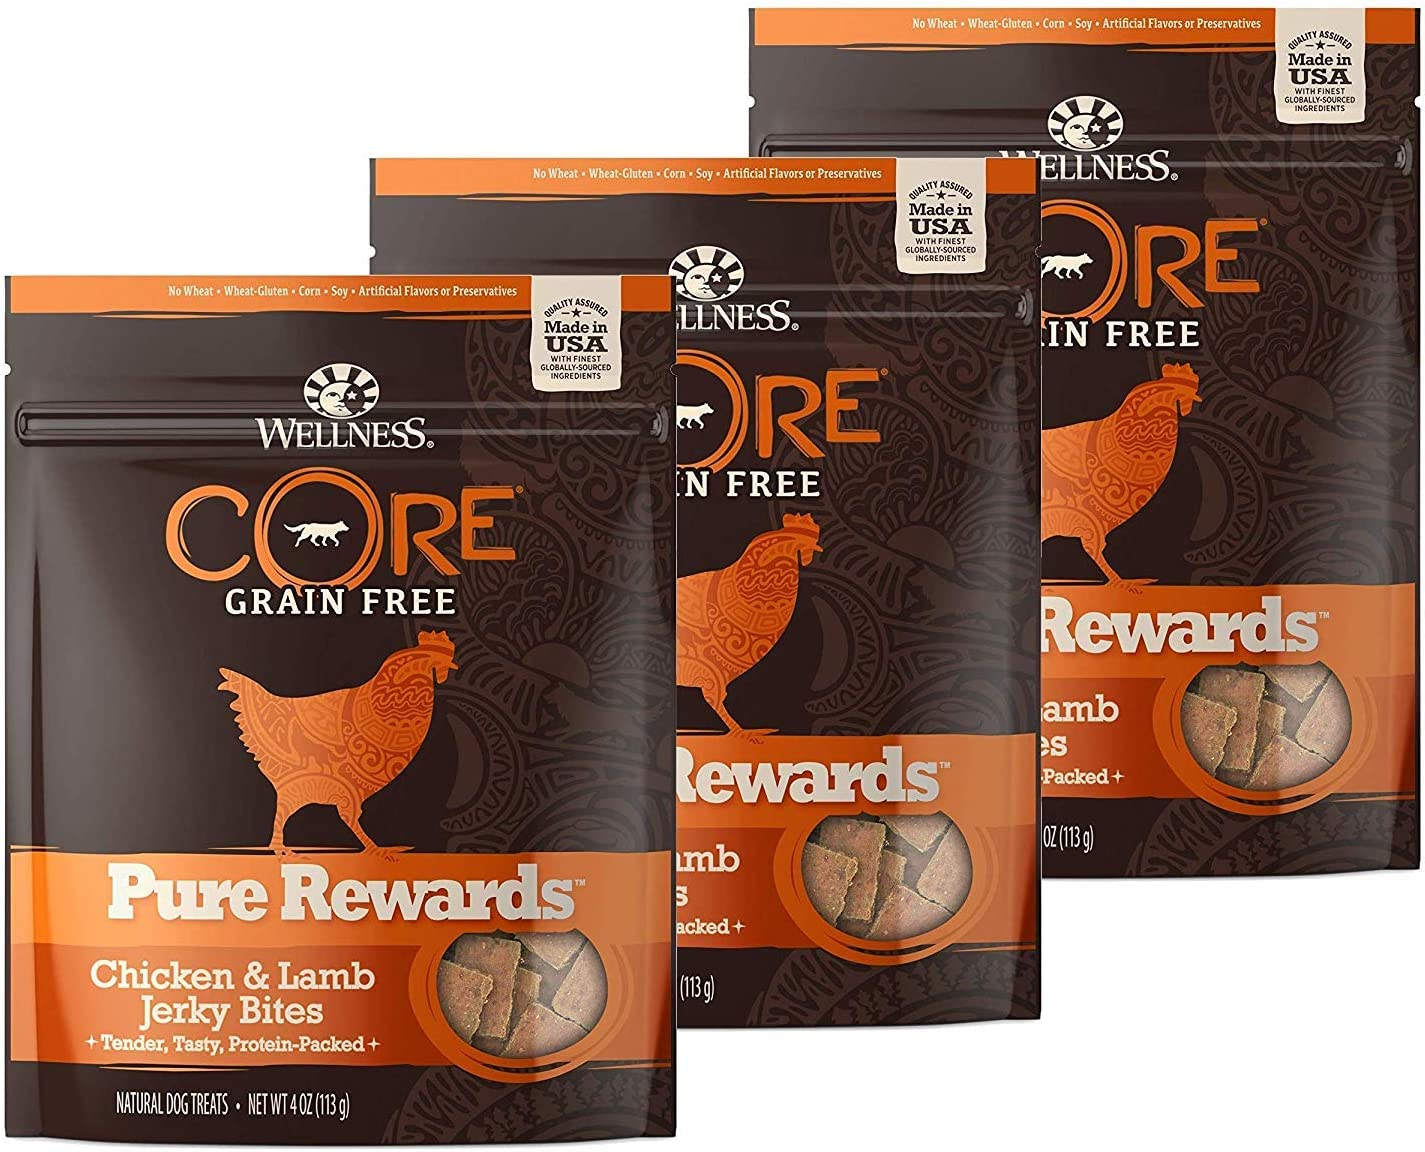 WELLNESS CORE 3 Pack Natural Grain Free Dog Treats, Soft Jerky Bites, 4-Ounce Bag